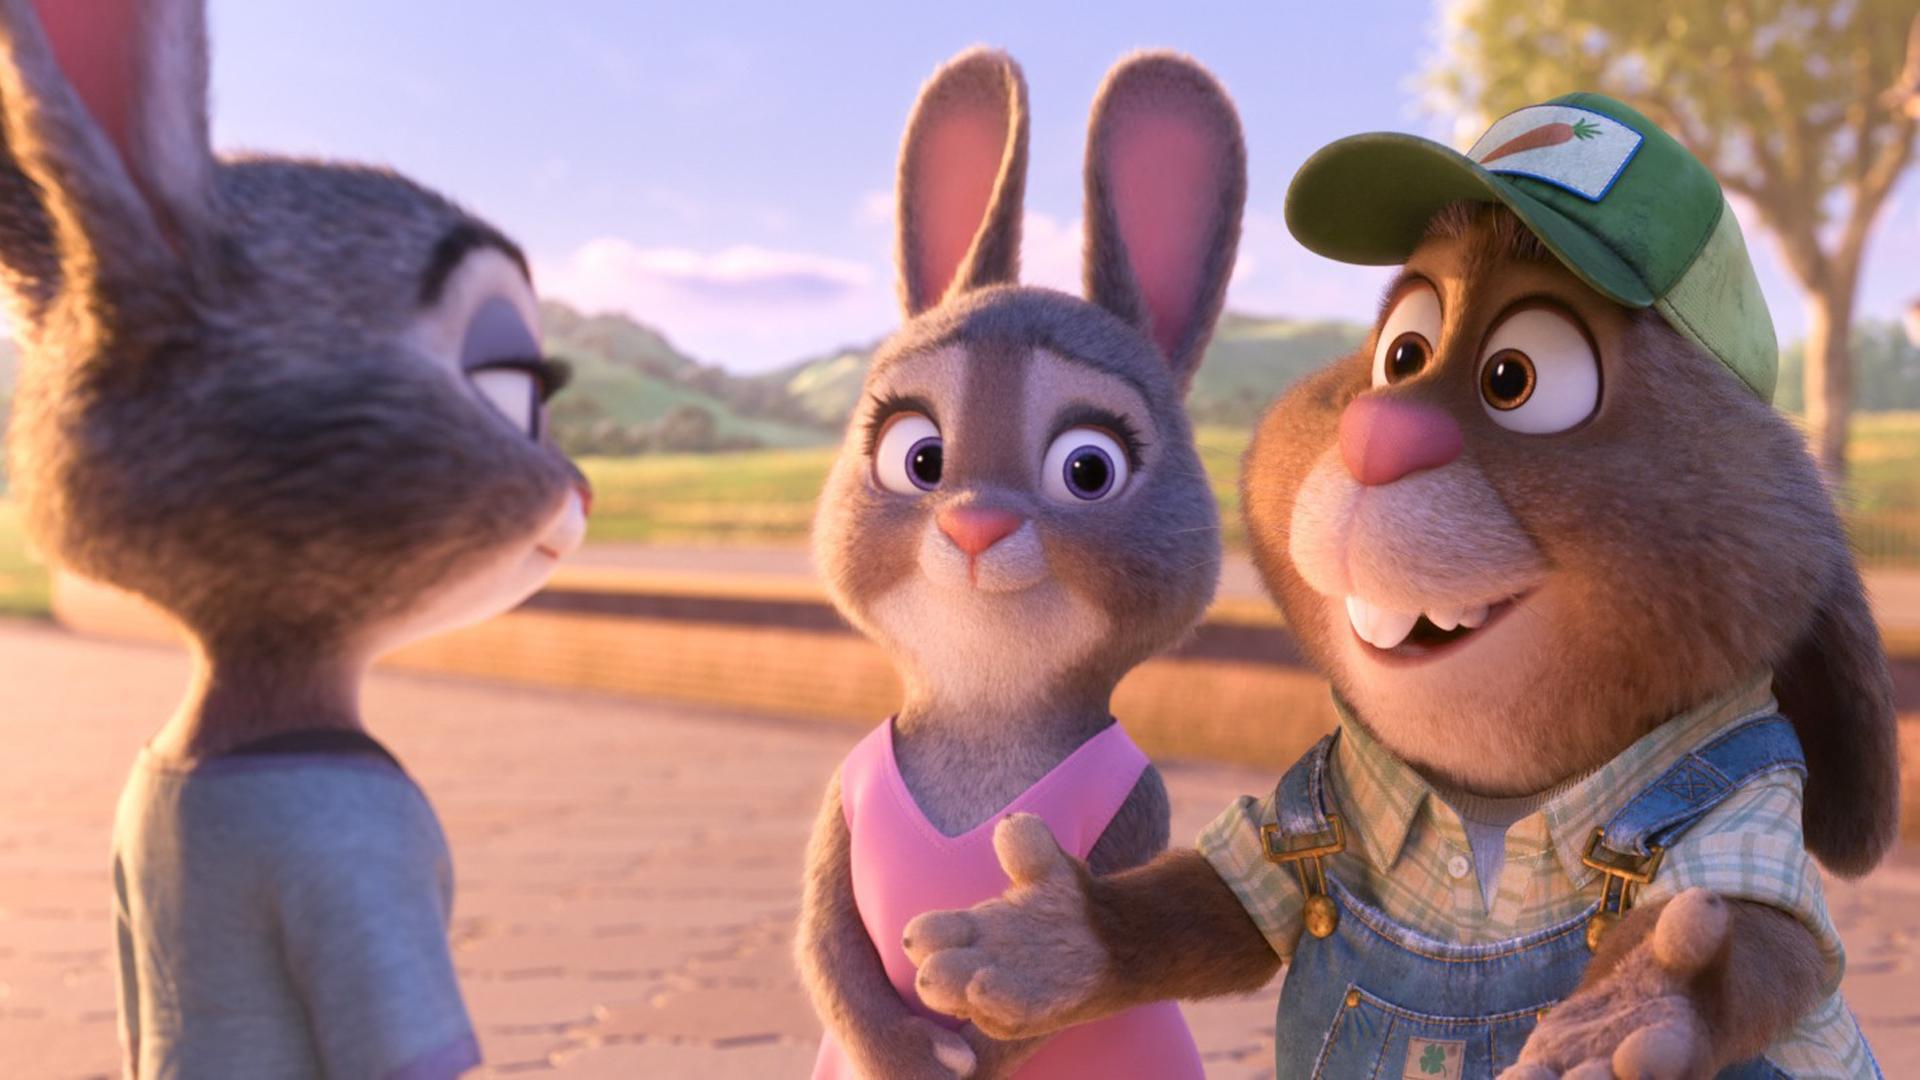 Películas de Disney llegarán a Netflix en septiembre